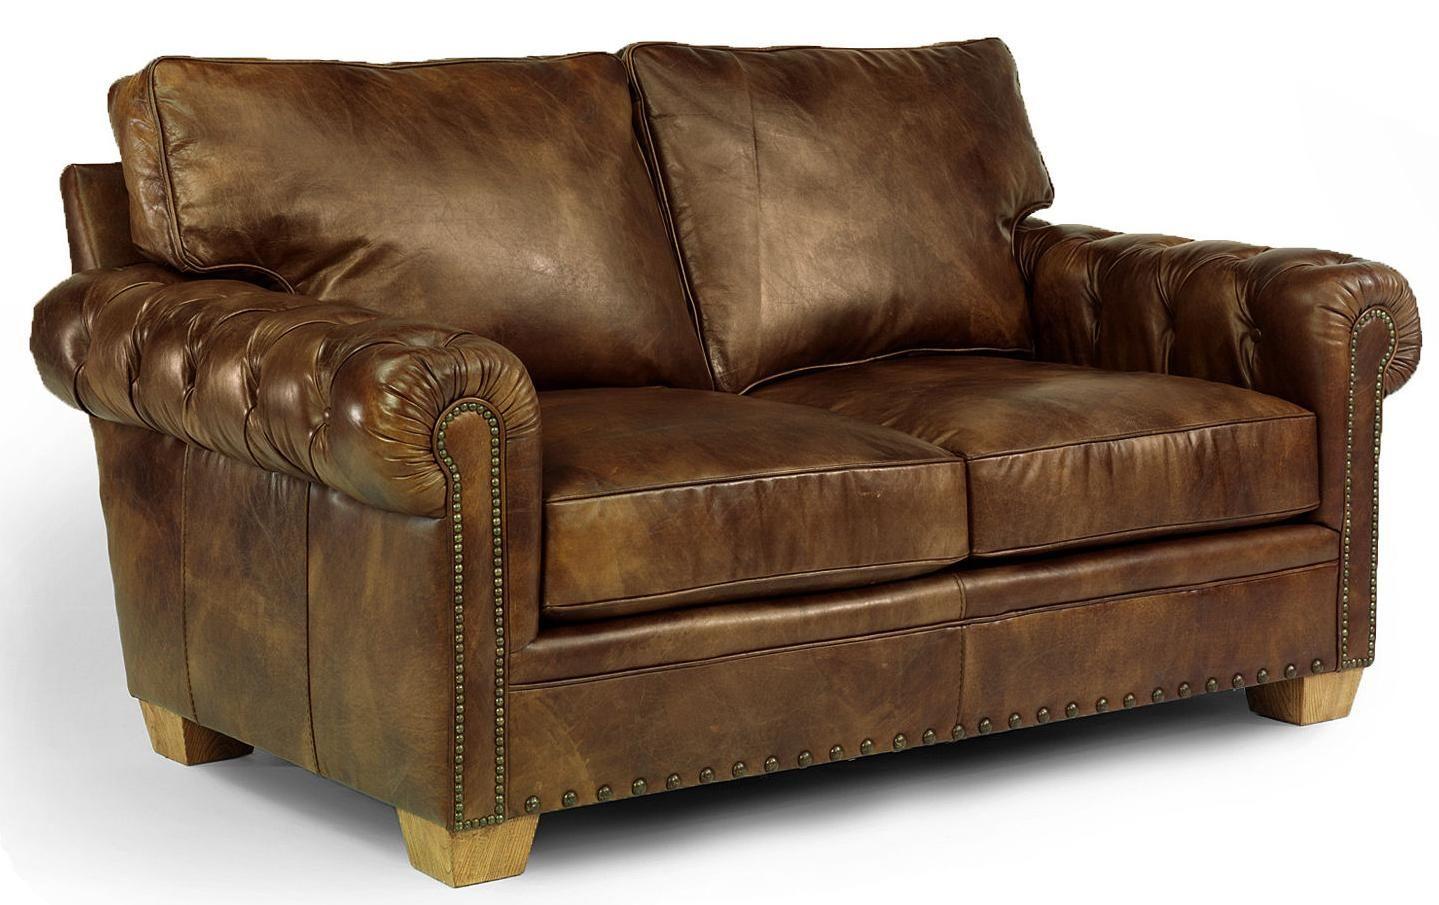 Flexsteel Furniture Latitudes Somerset Collection